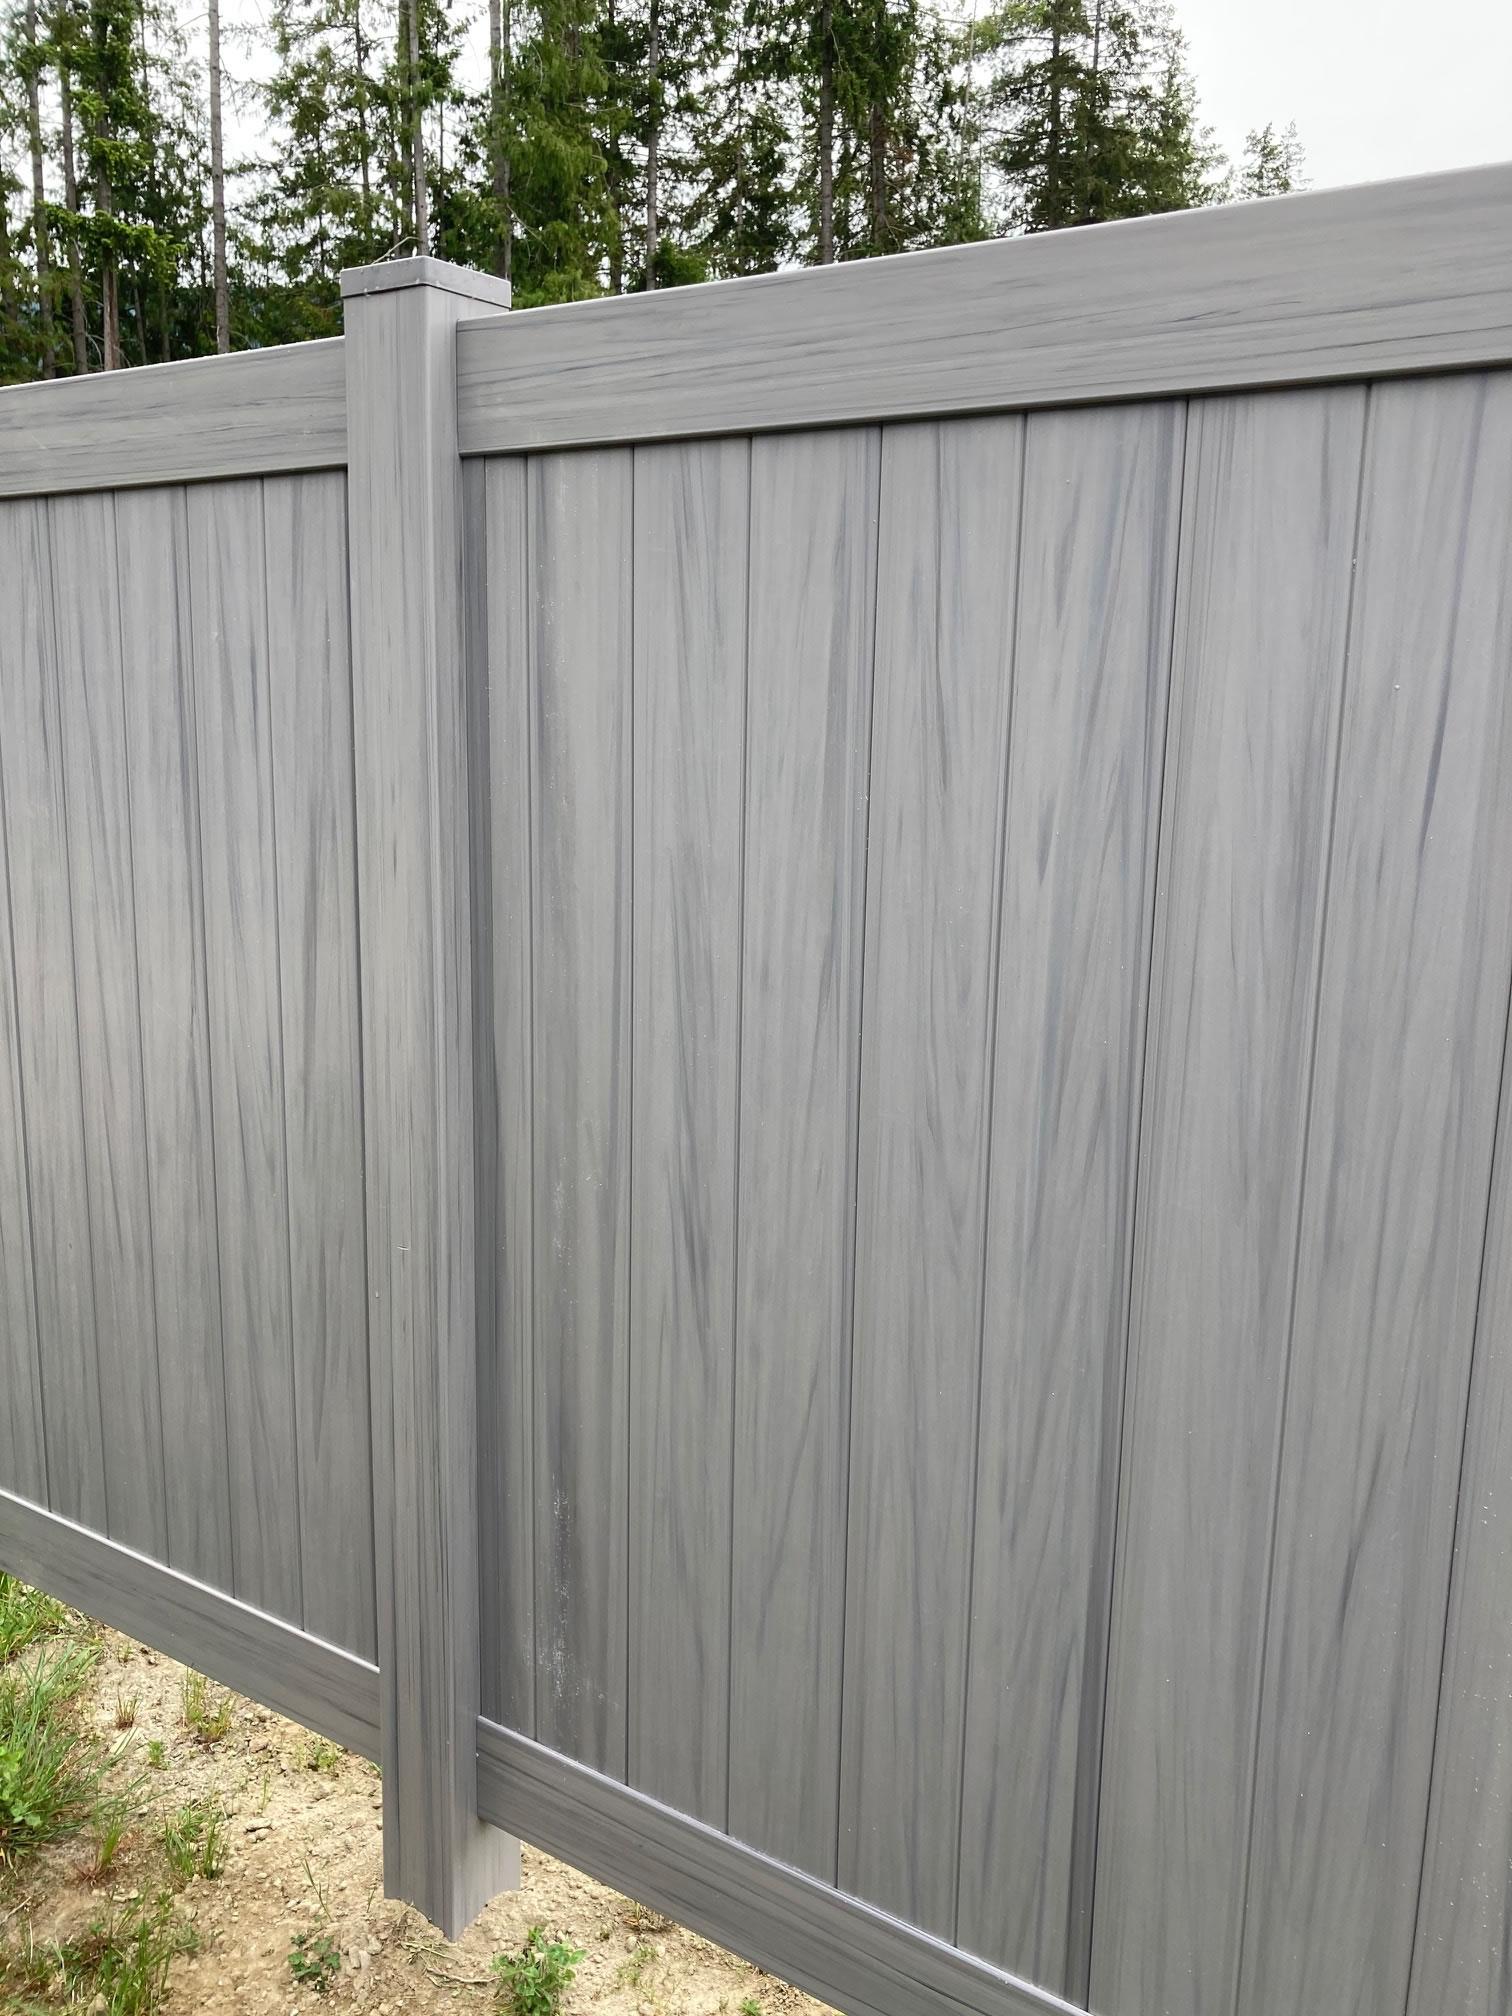 woodgrain vinyl fence